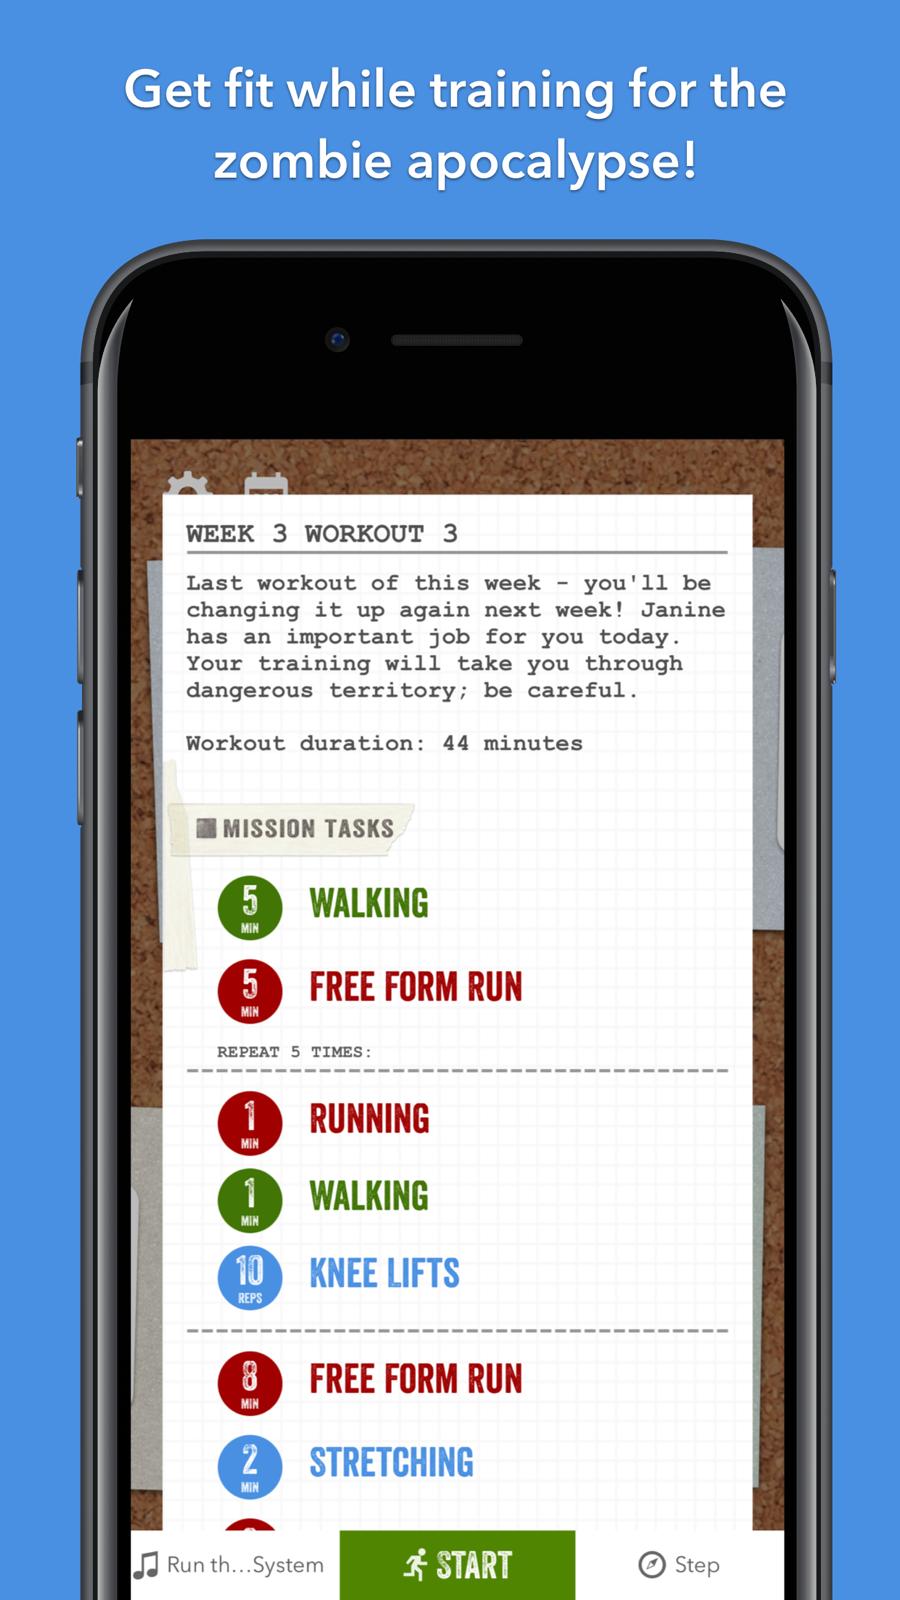 Zombies, Run! 5k Training on the App Store 5k training